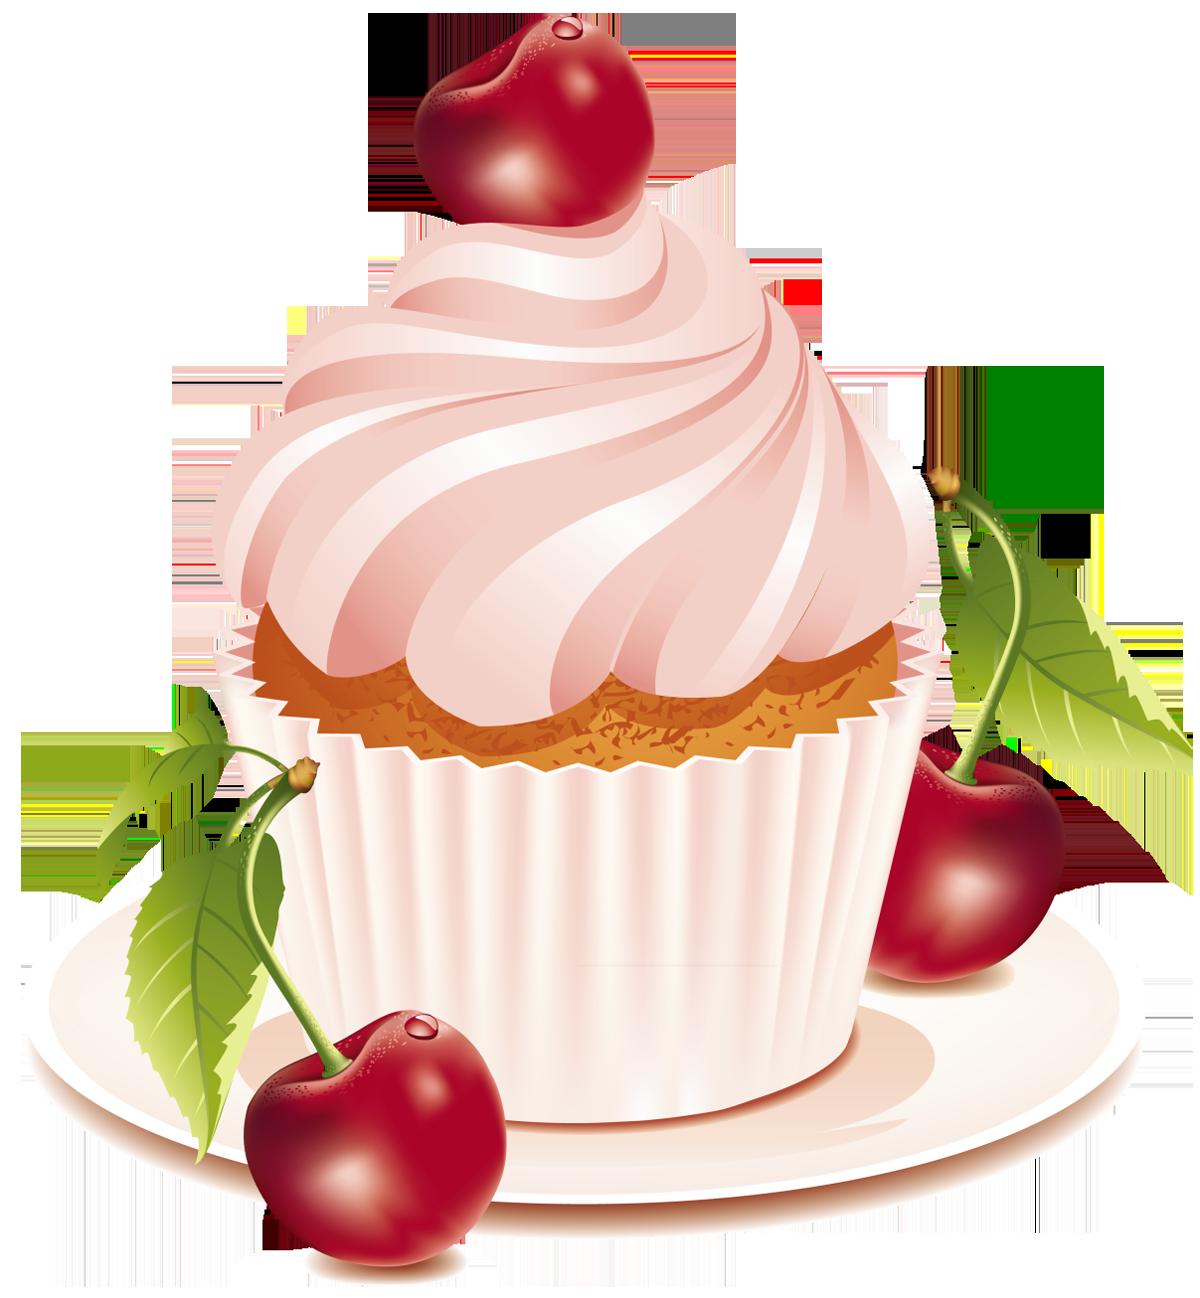 Christmas cake clipart jpg black and white Free cake clip art 2 - Clipartix jpg black and white